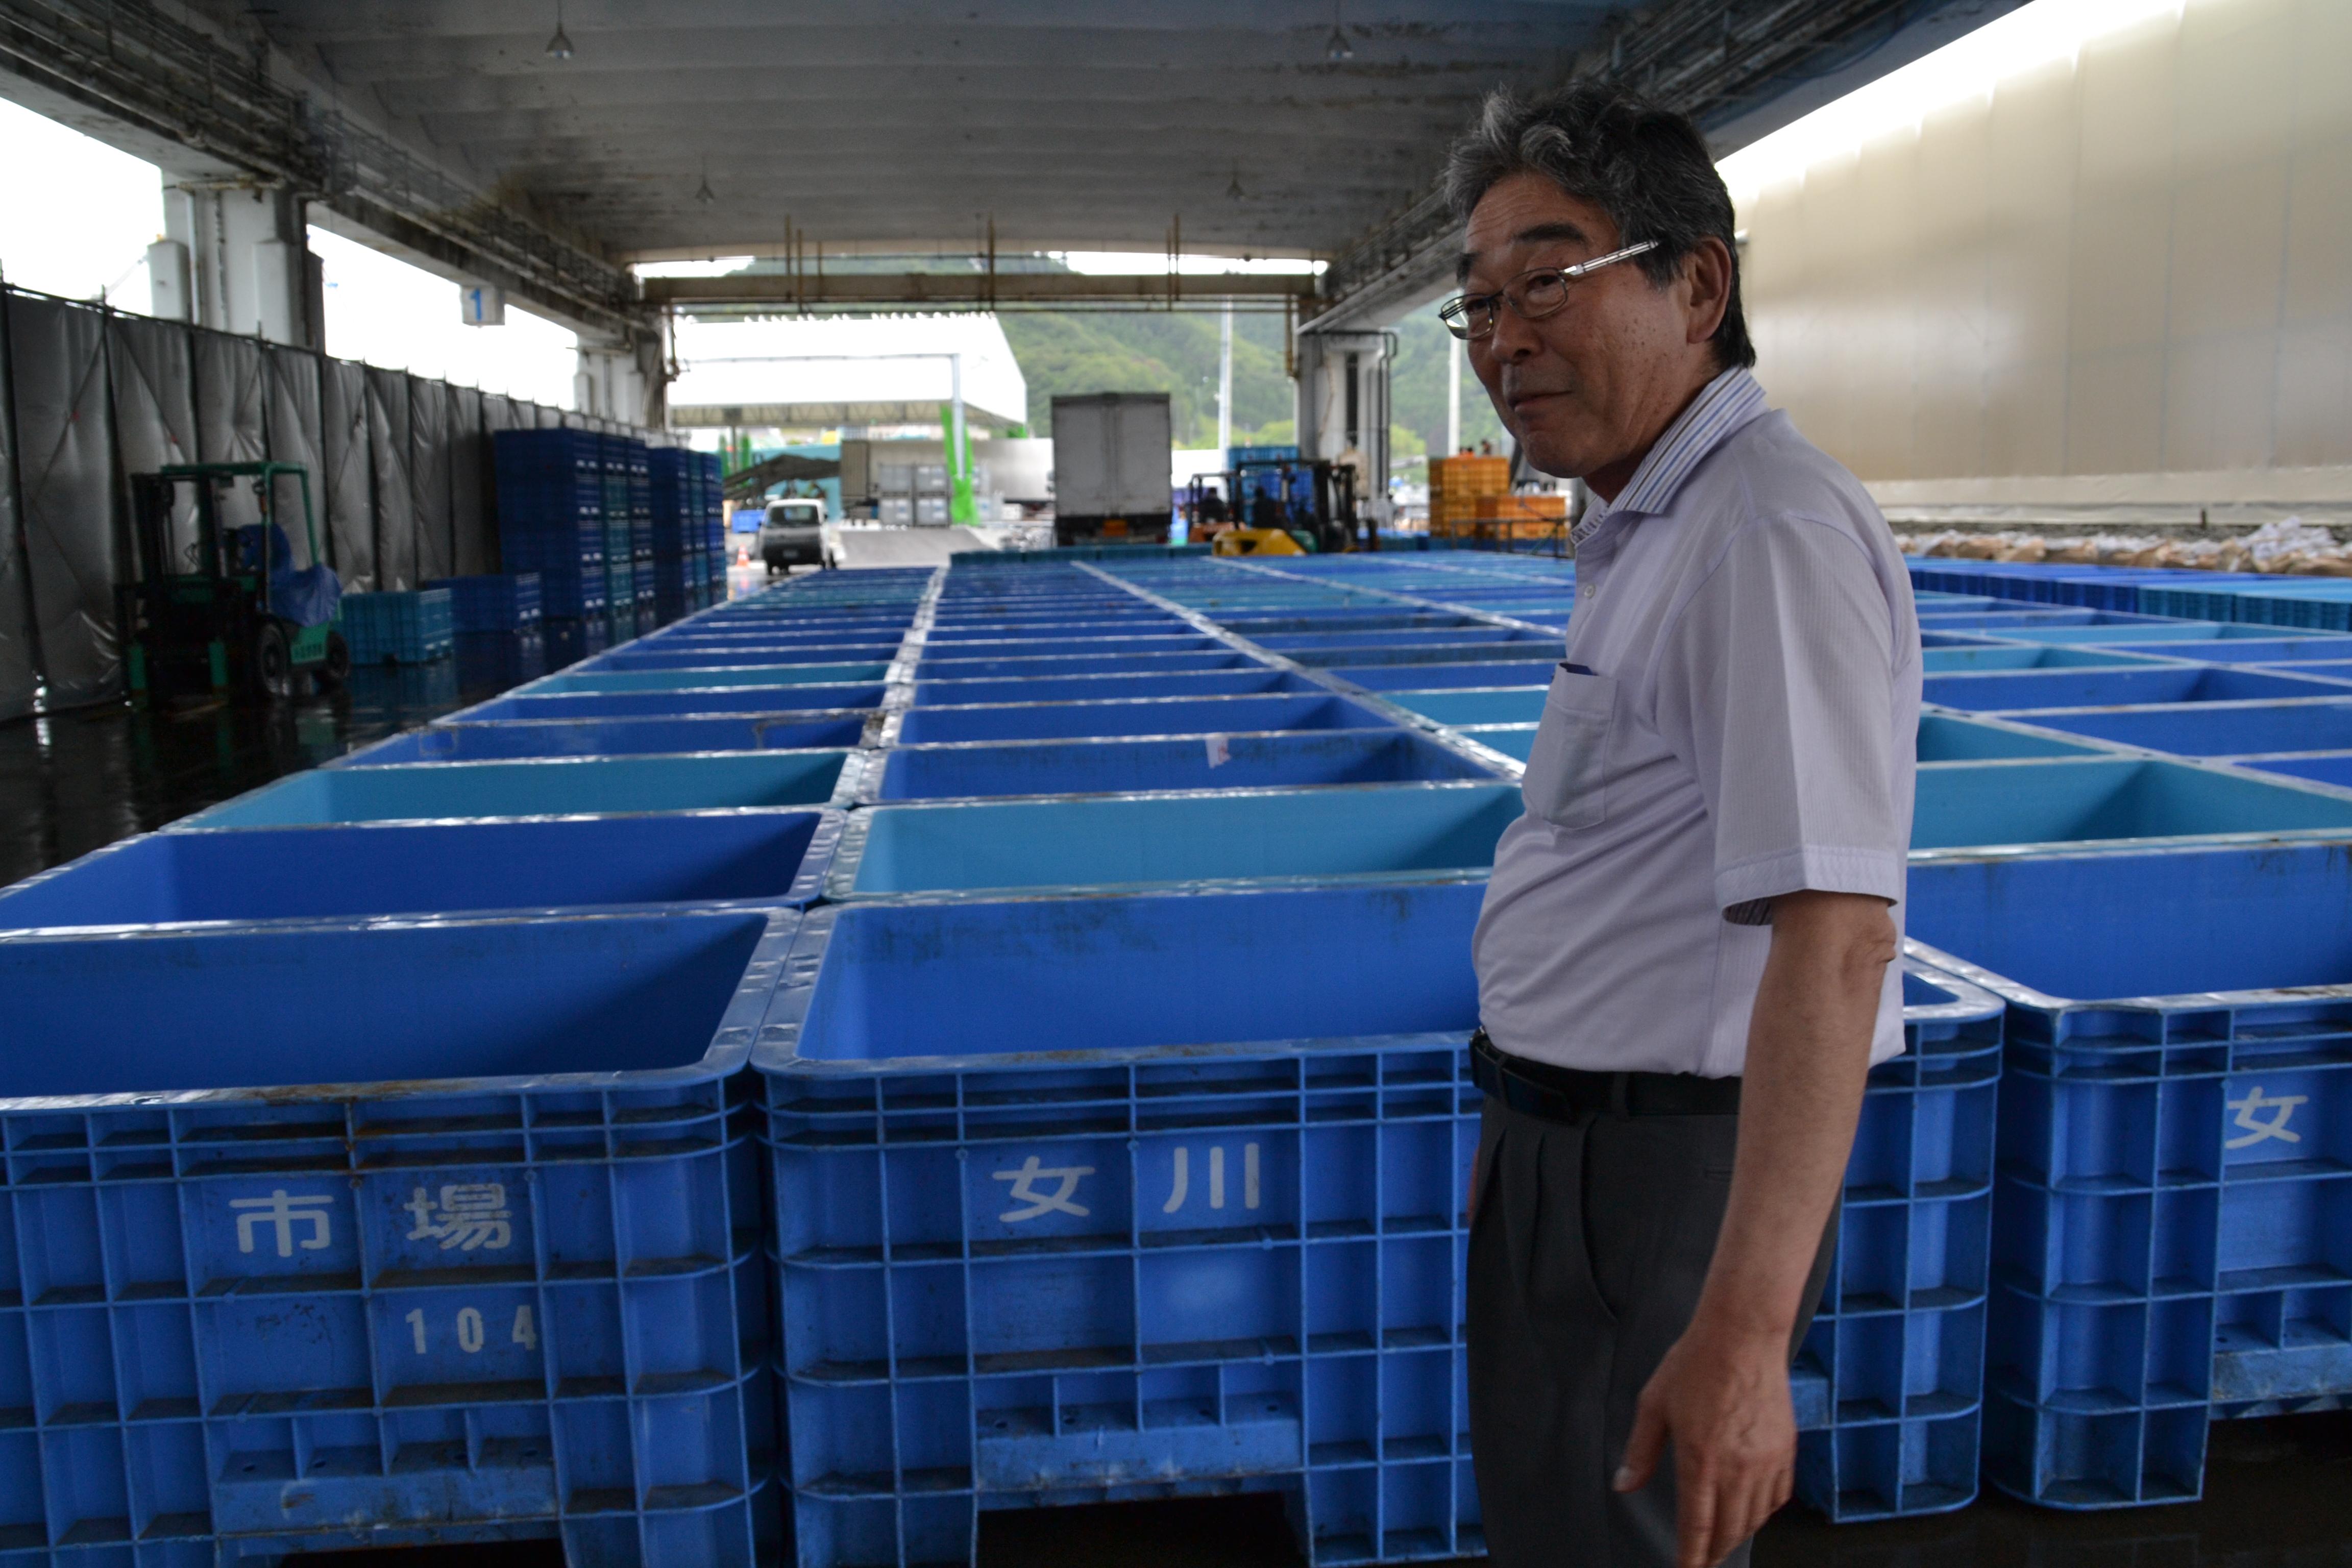 onagawa fisheries kato and blue boxes donation.JPG